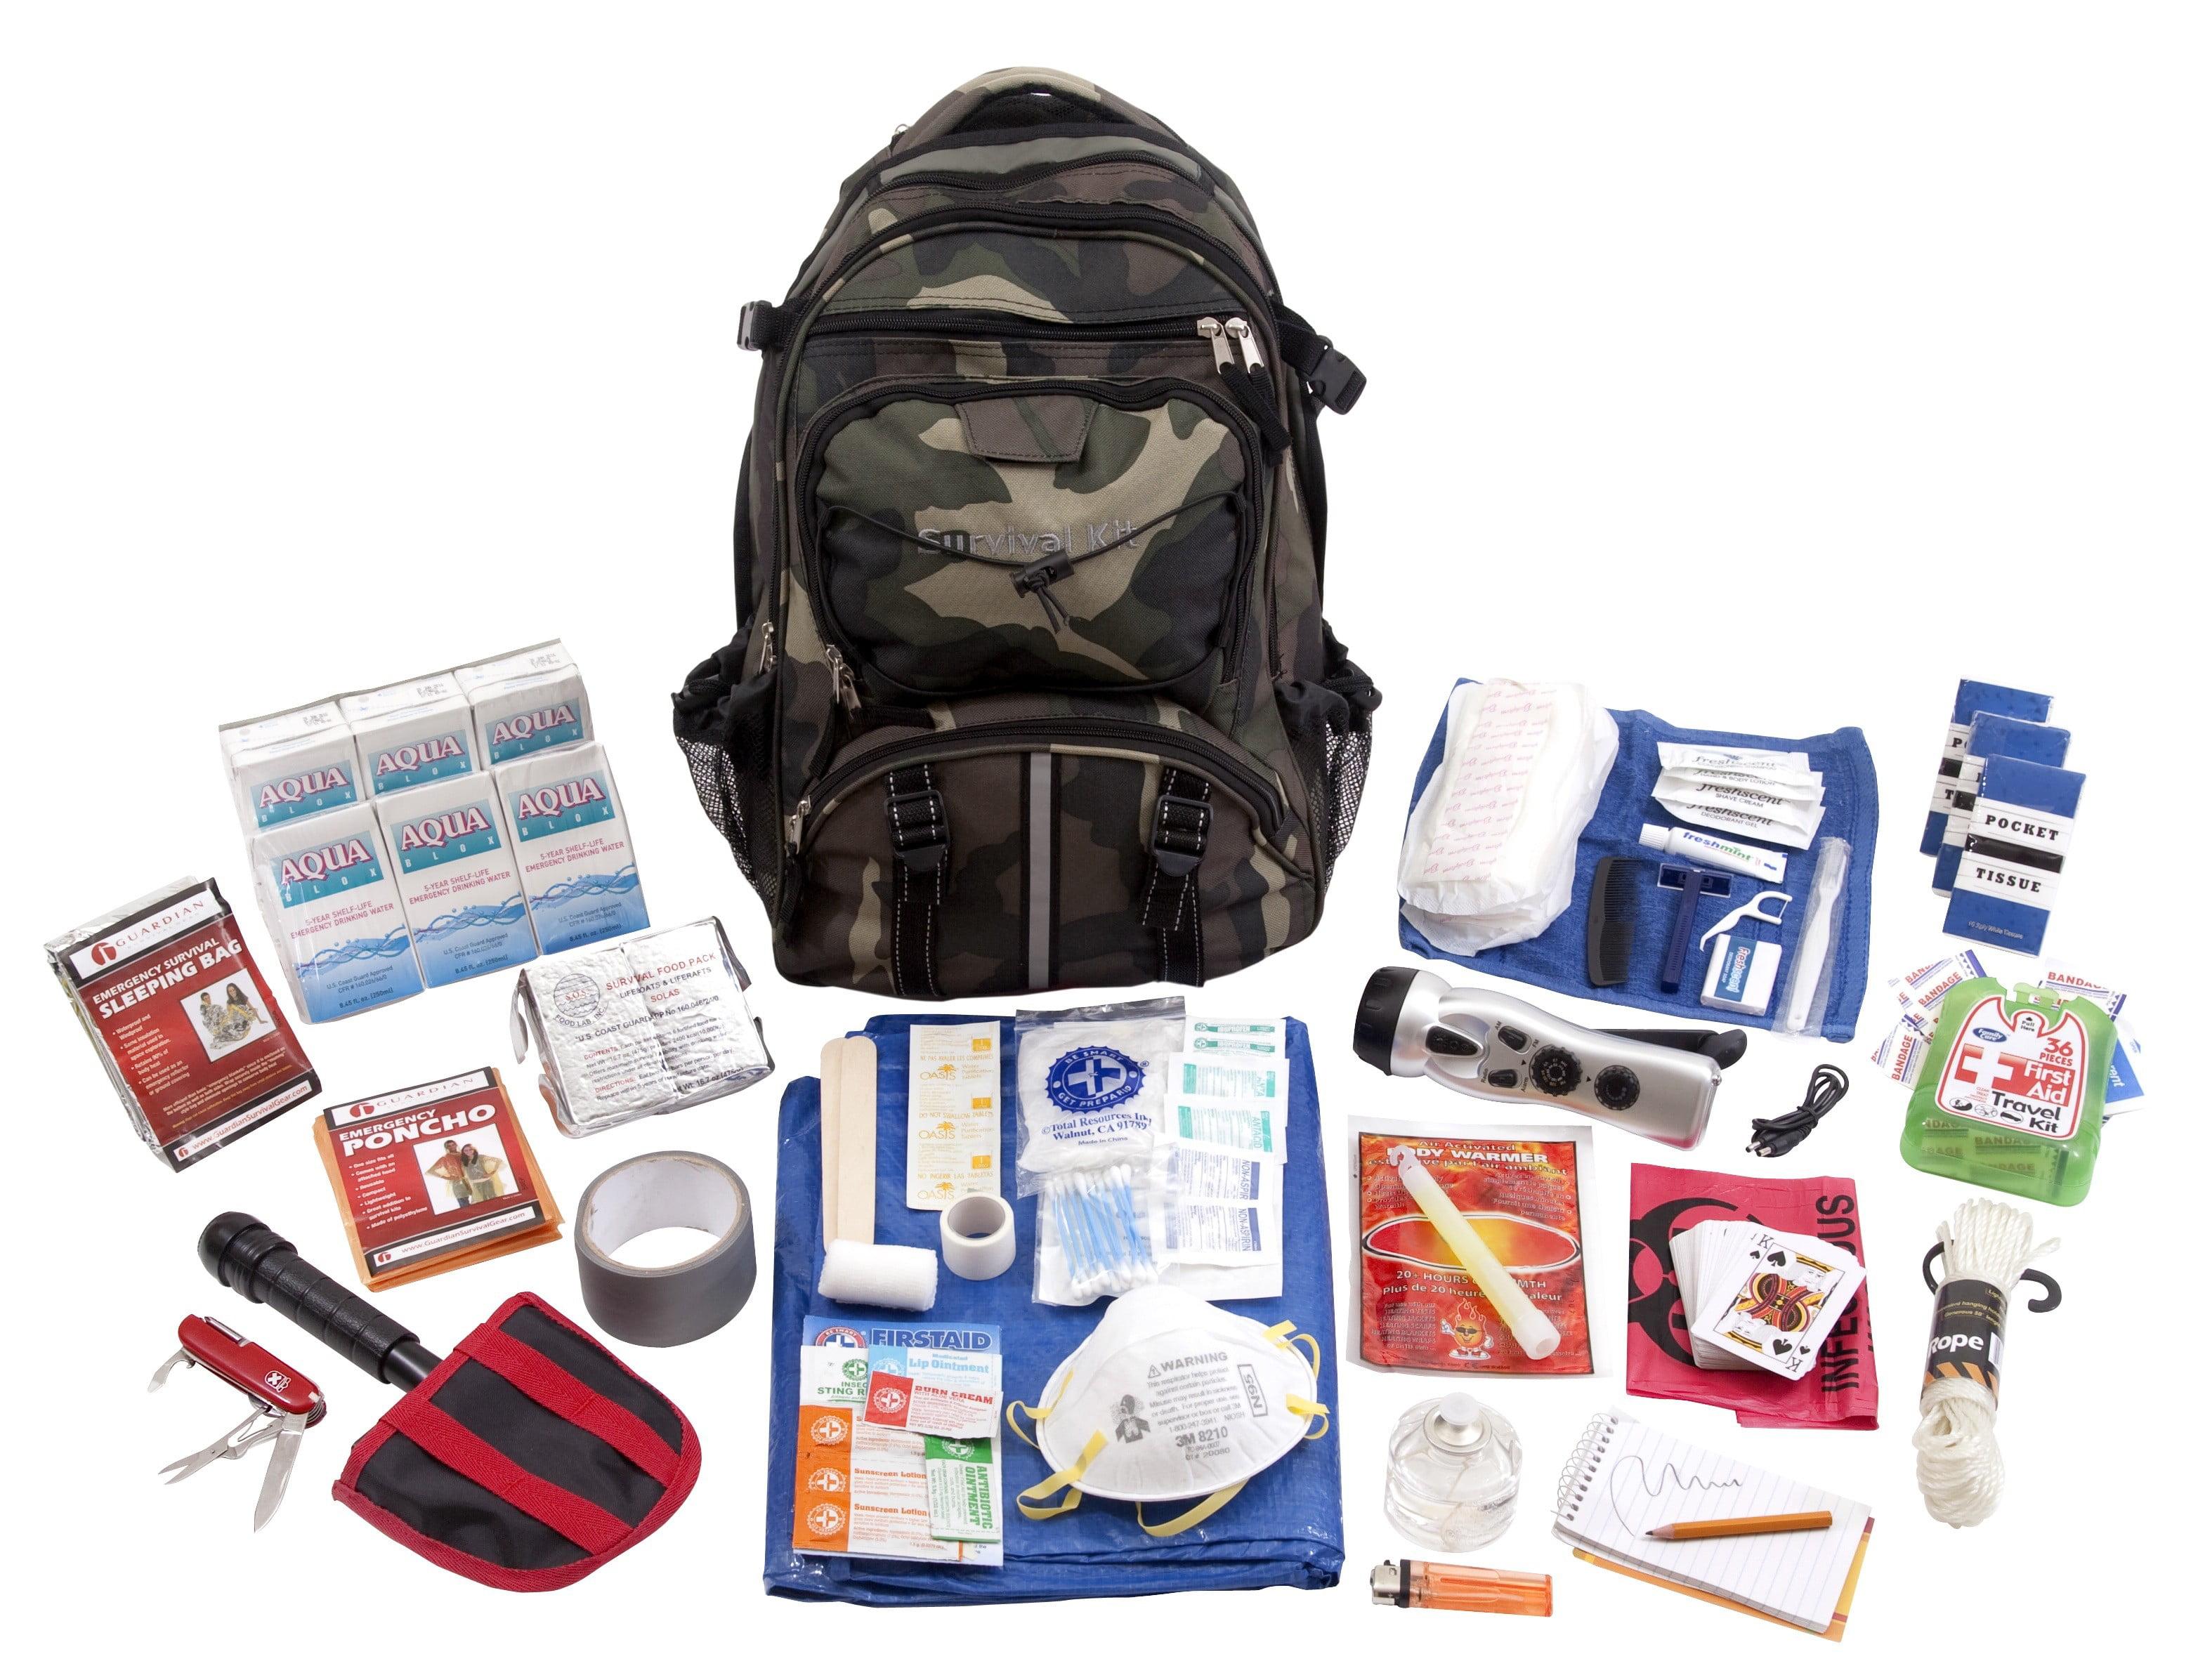 Guardian SKHK Hunters Survival Kit by Guardian Survival Gear